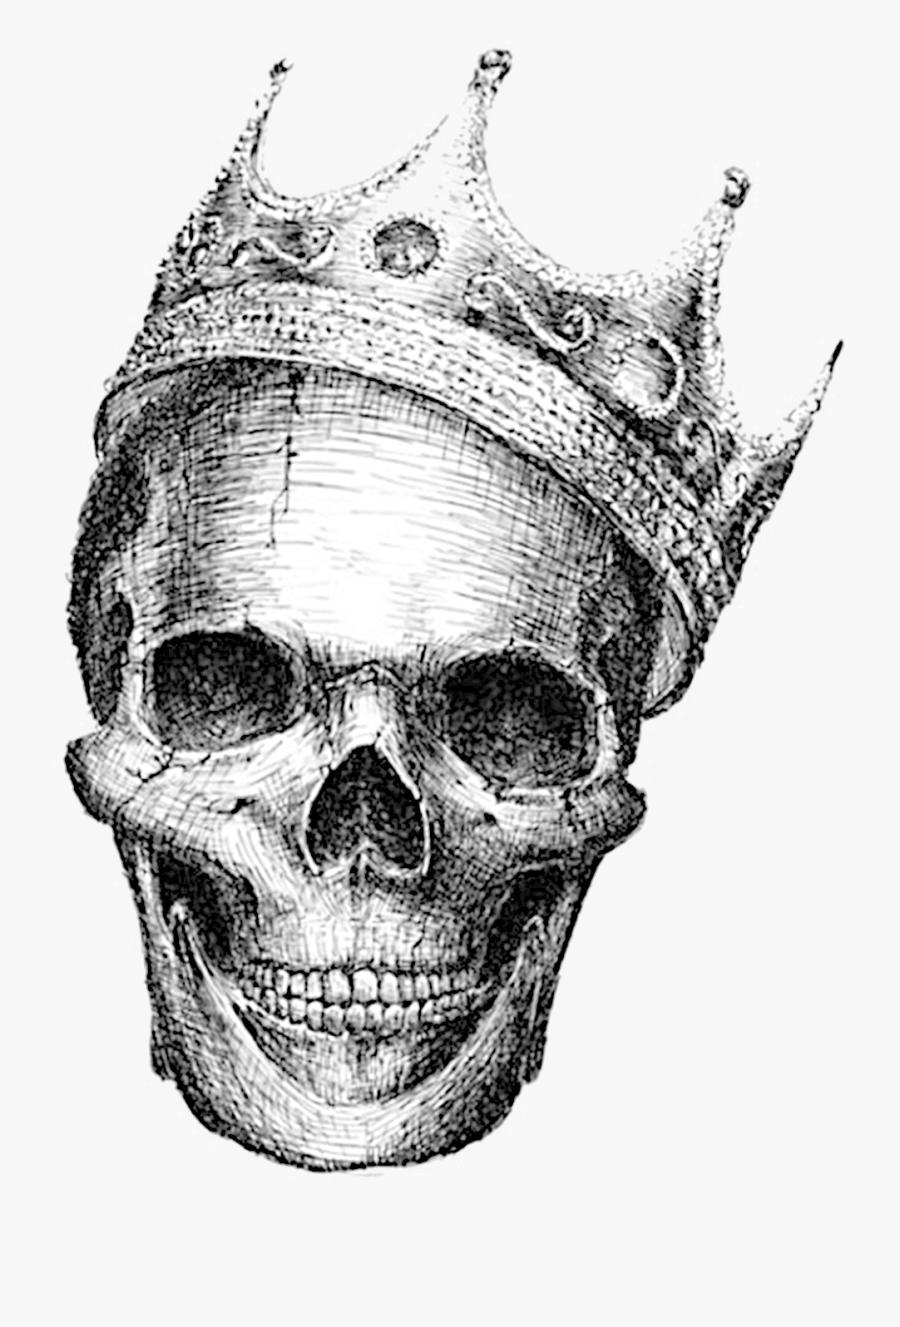 Skeleton Skull Calavera Human Symbolism Drawing Clipart - Black And White Skull Drawings, Transparent Clipart